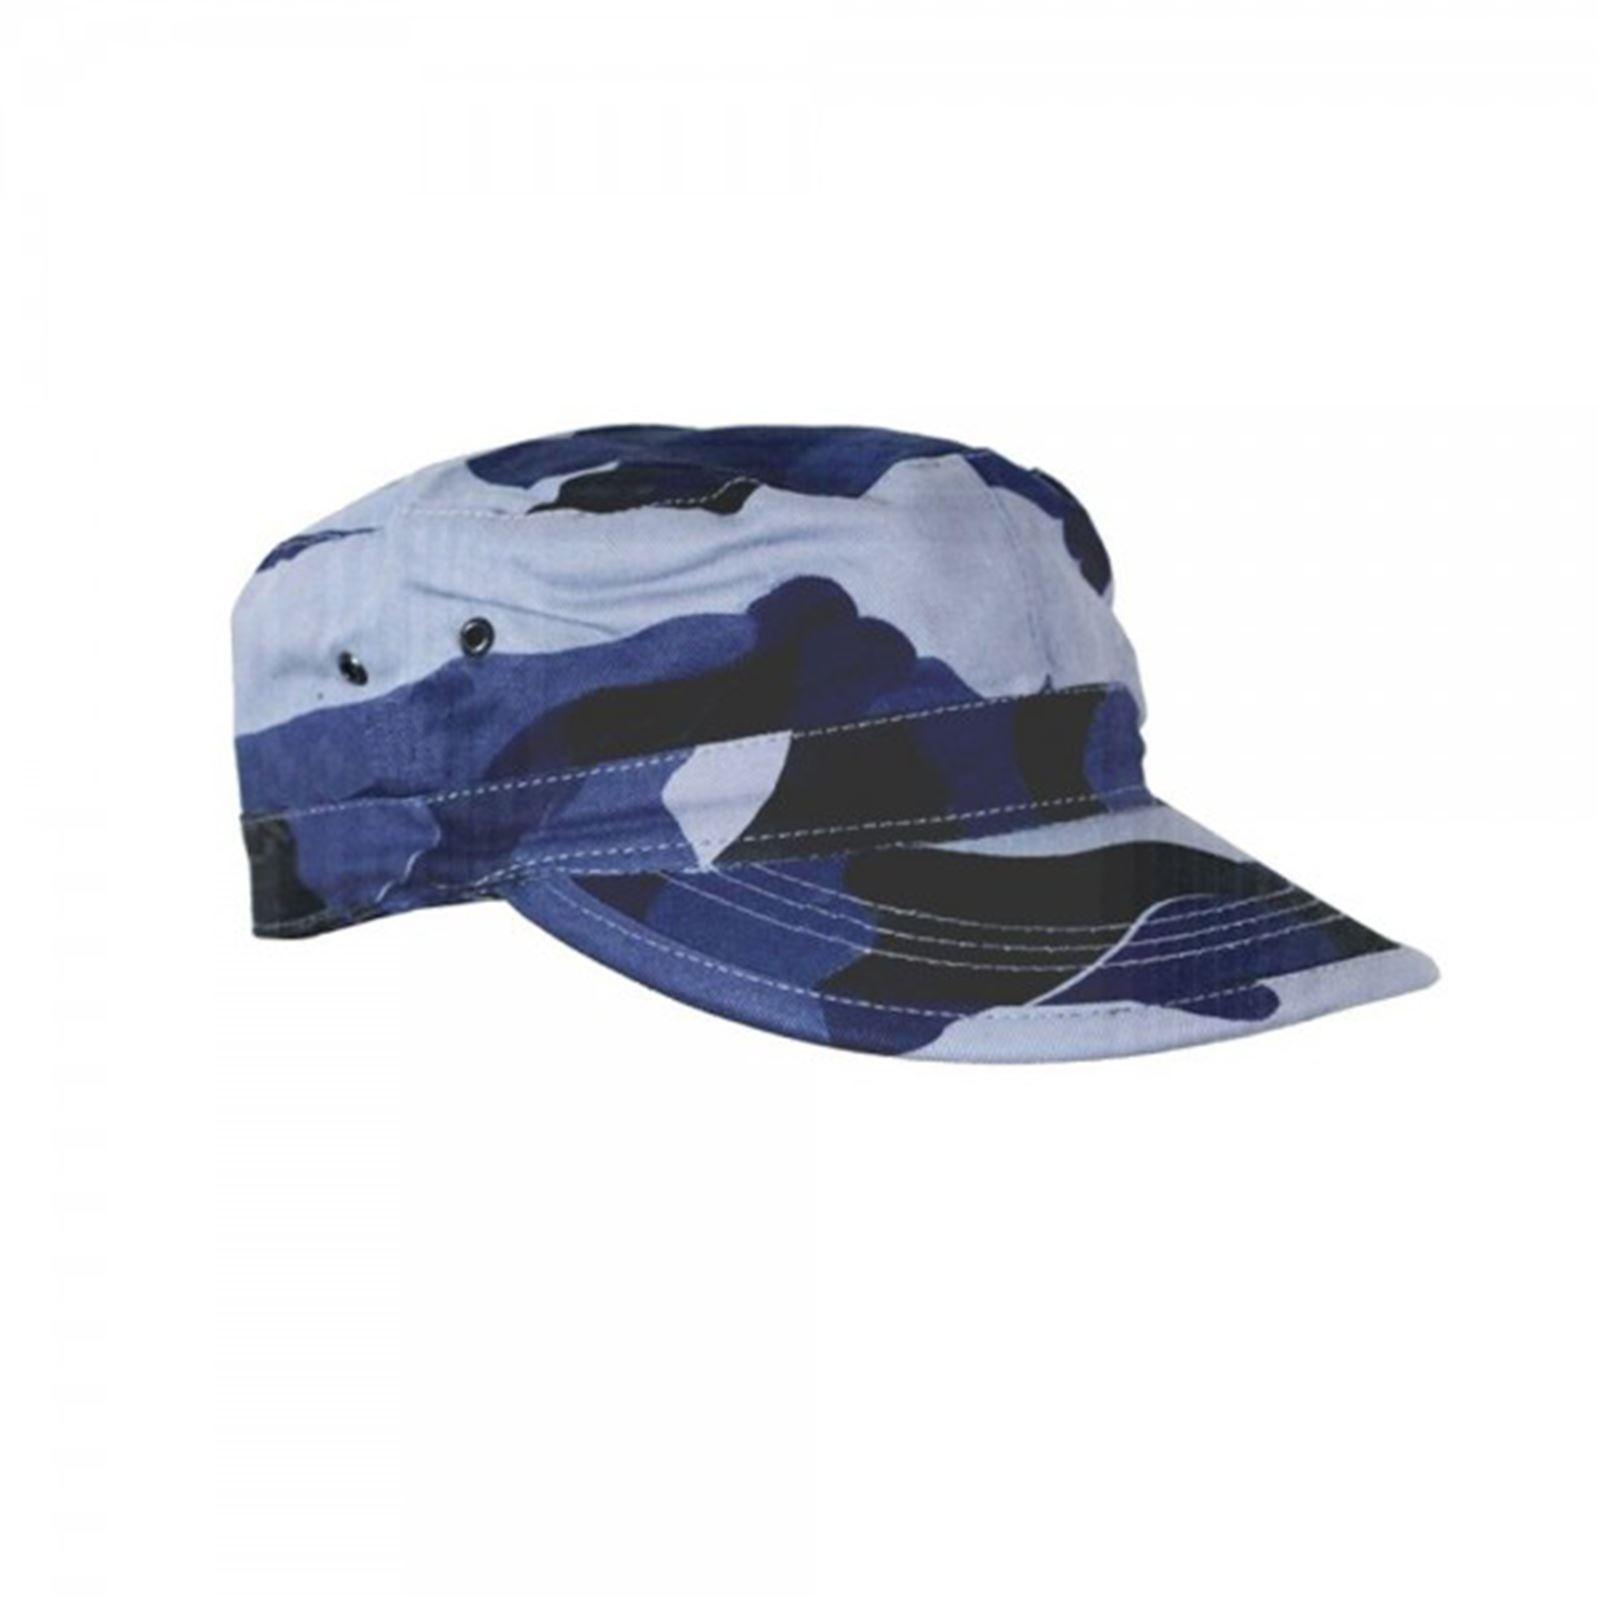 bdda9ea8515 Kas kids blue camo camouflage army cap baseball hat cap ebay jpg 1600x1600  Blue camo baseball